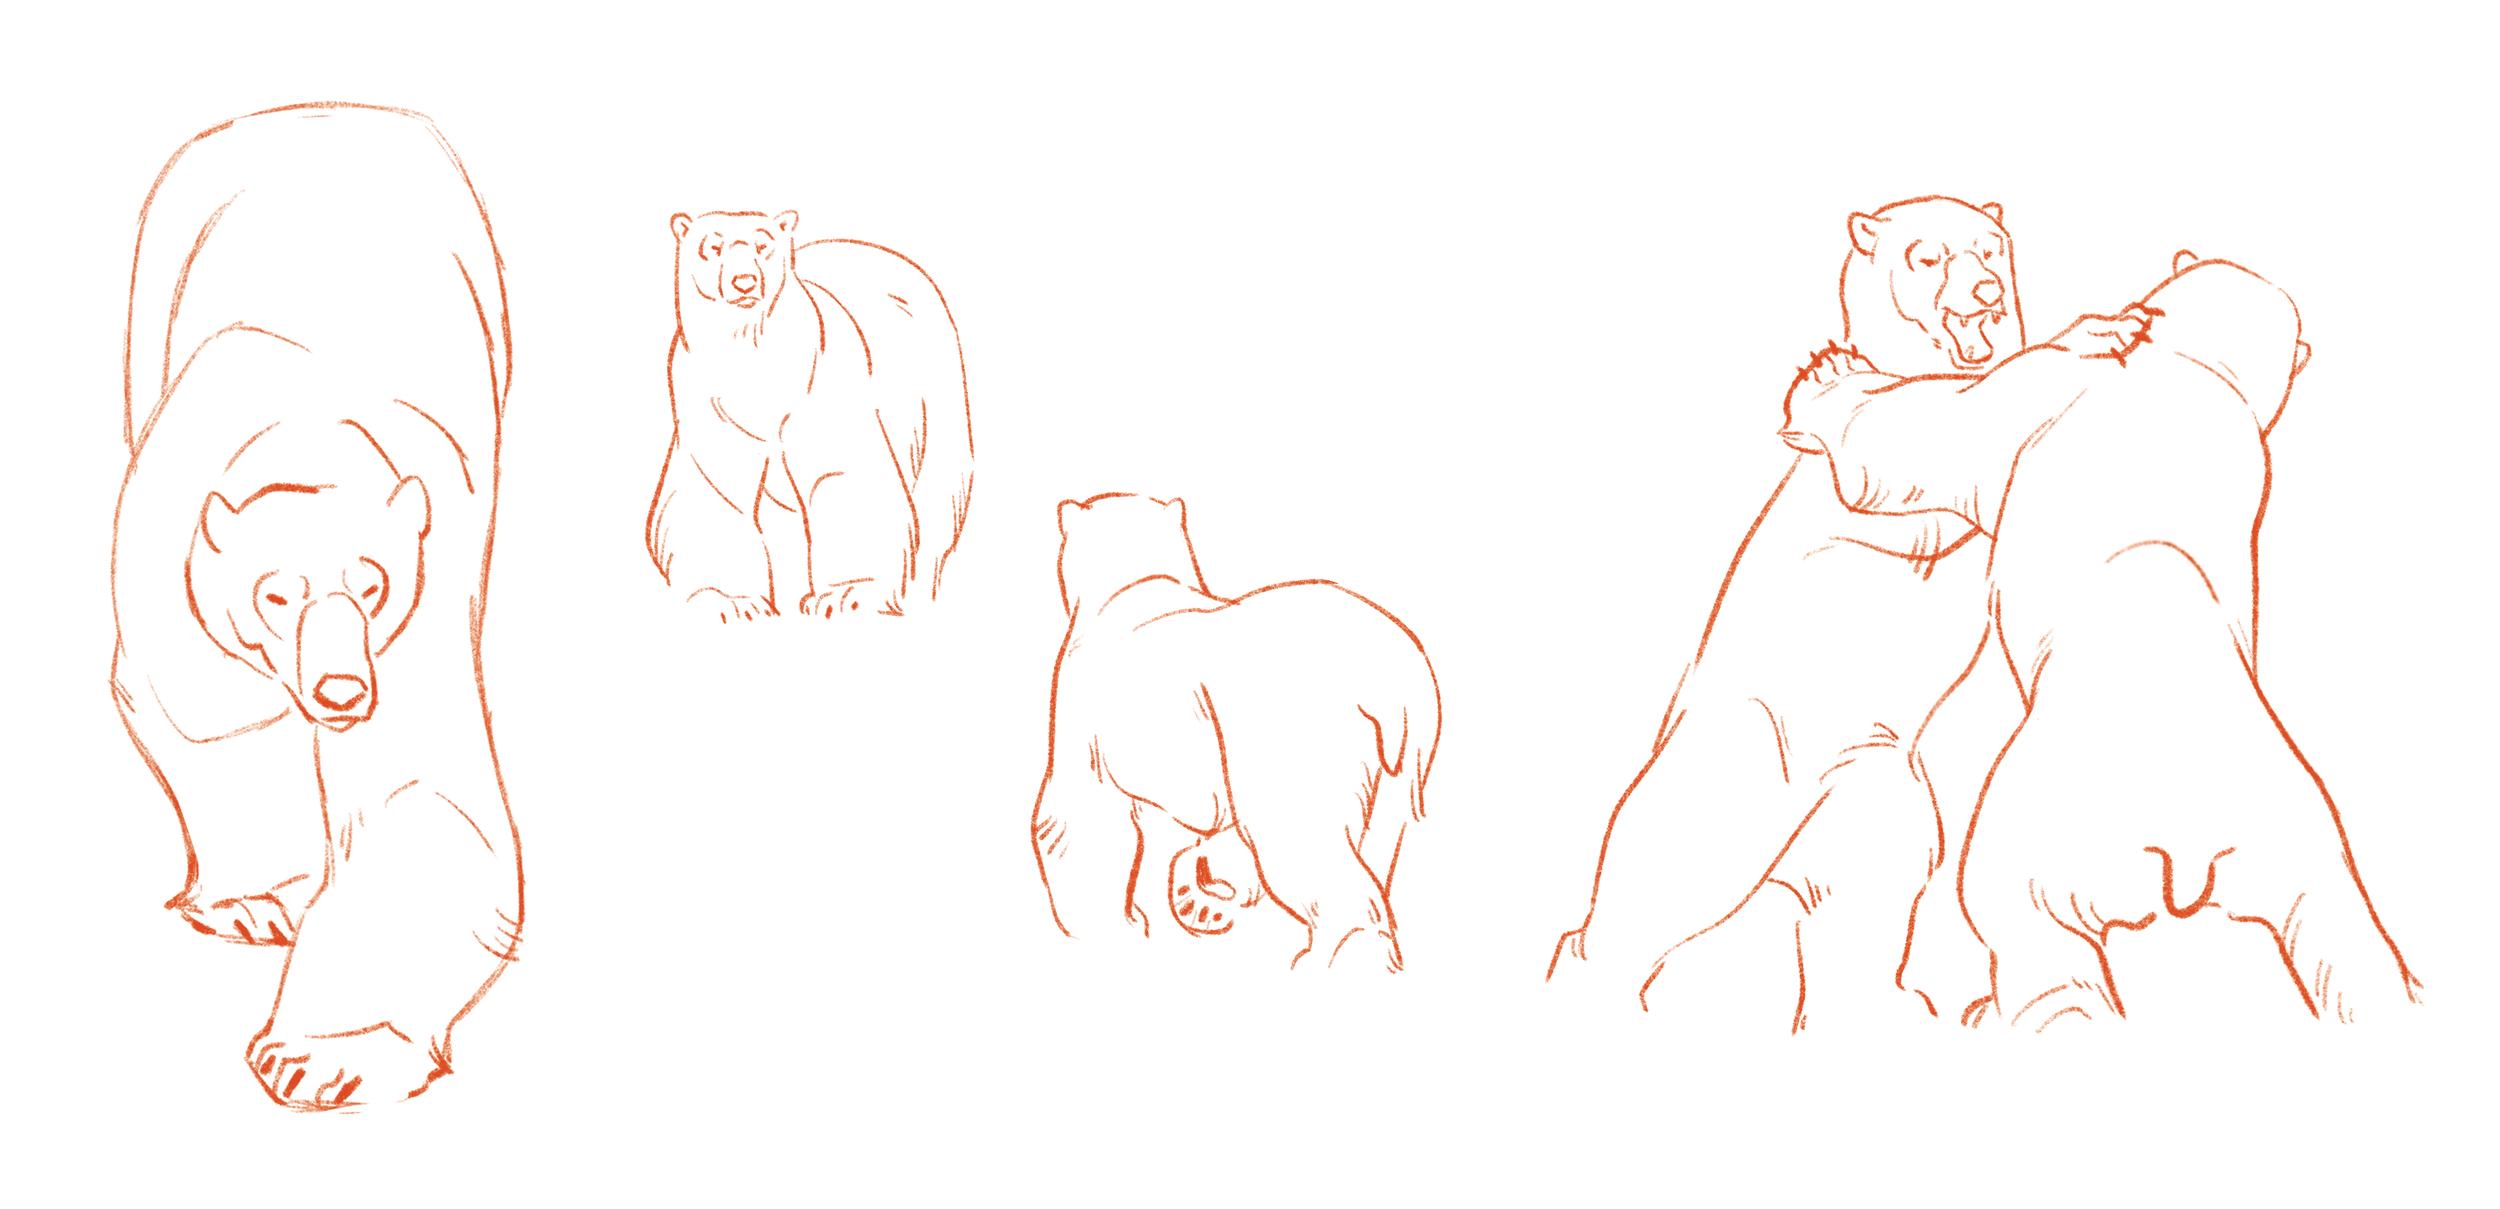 Poses of the Polar Bears  - Linework